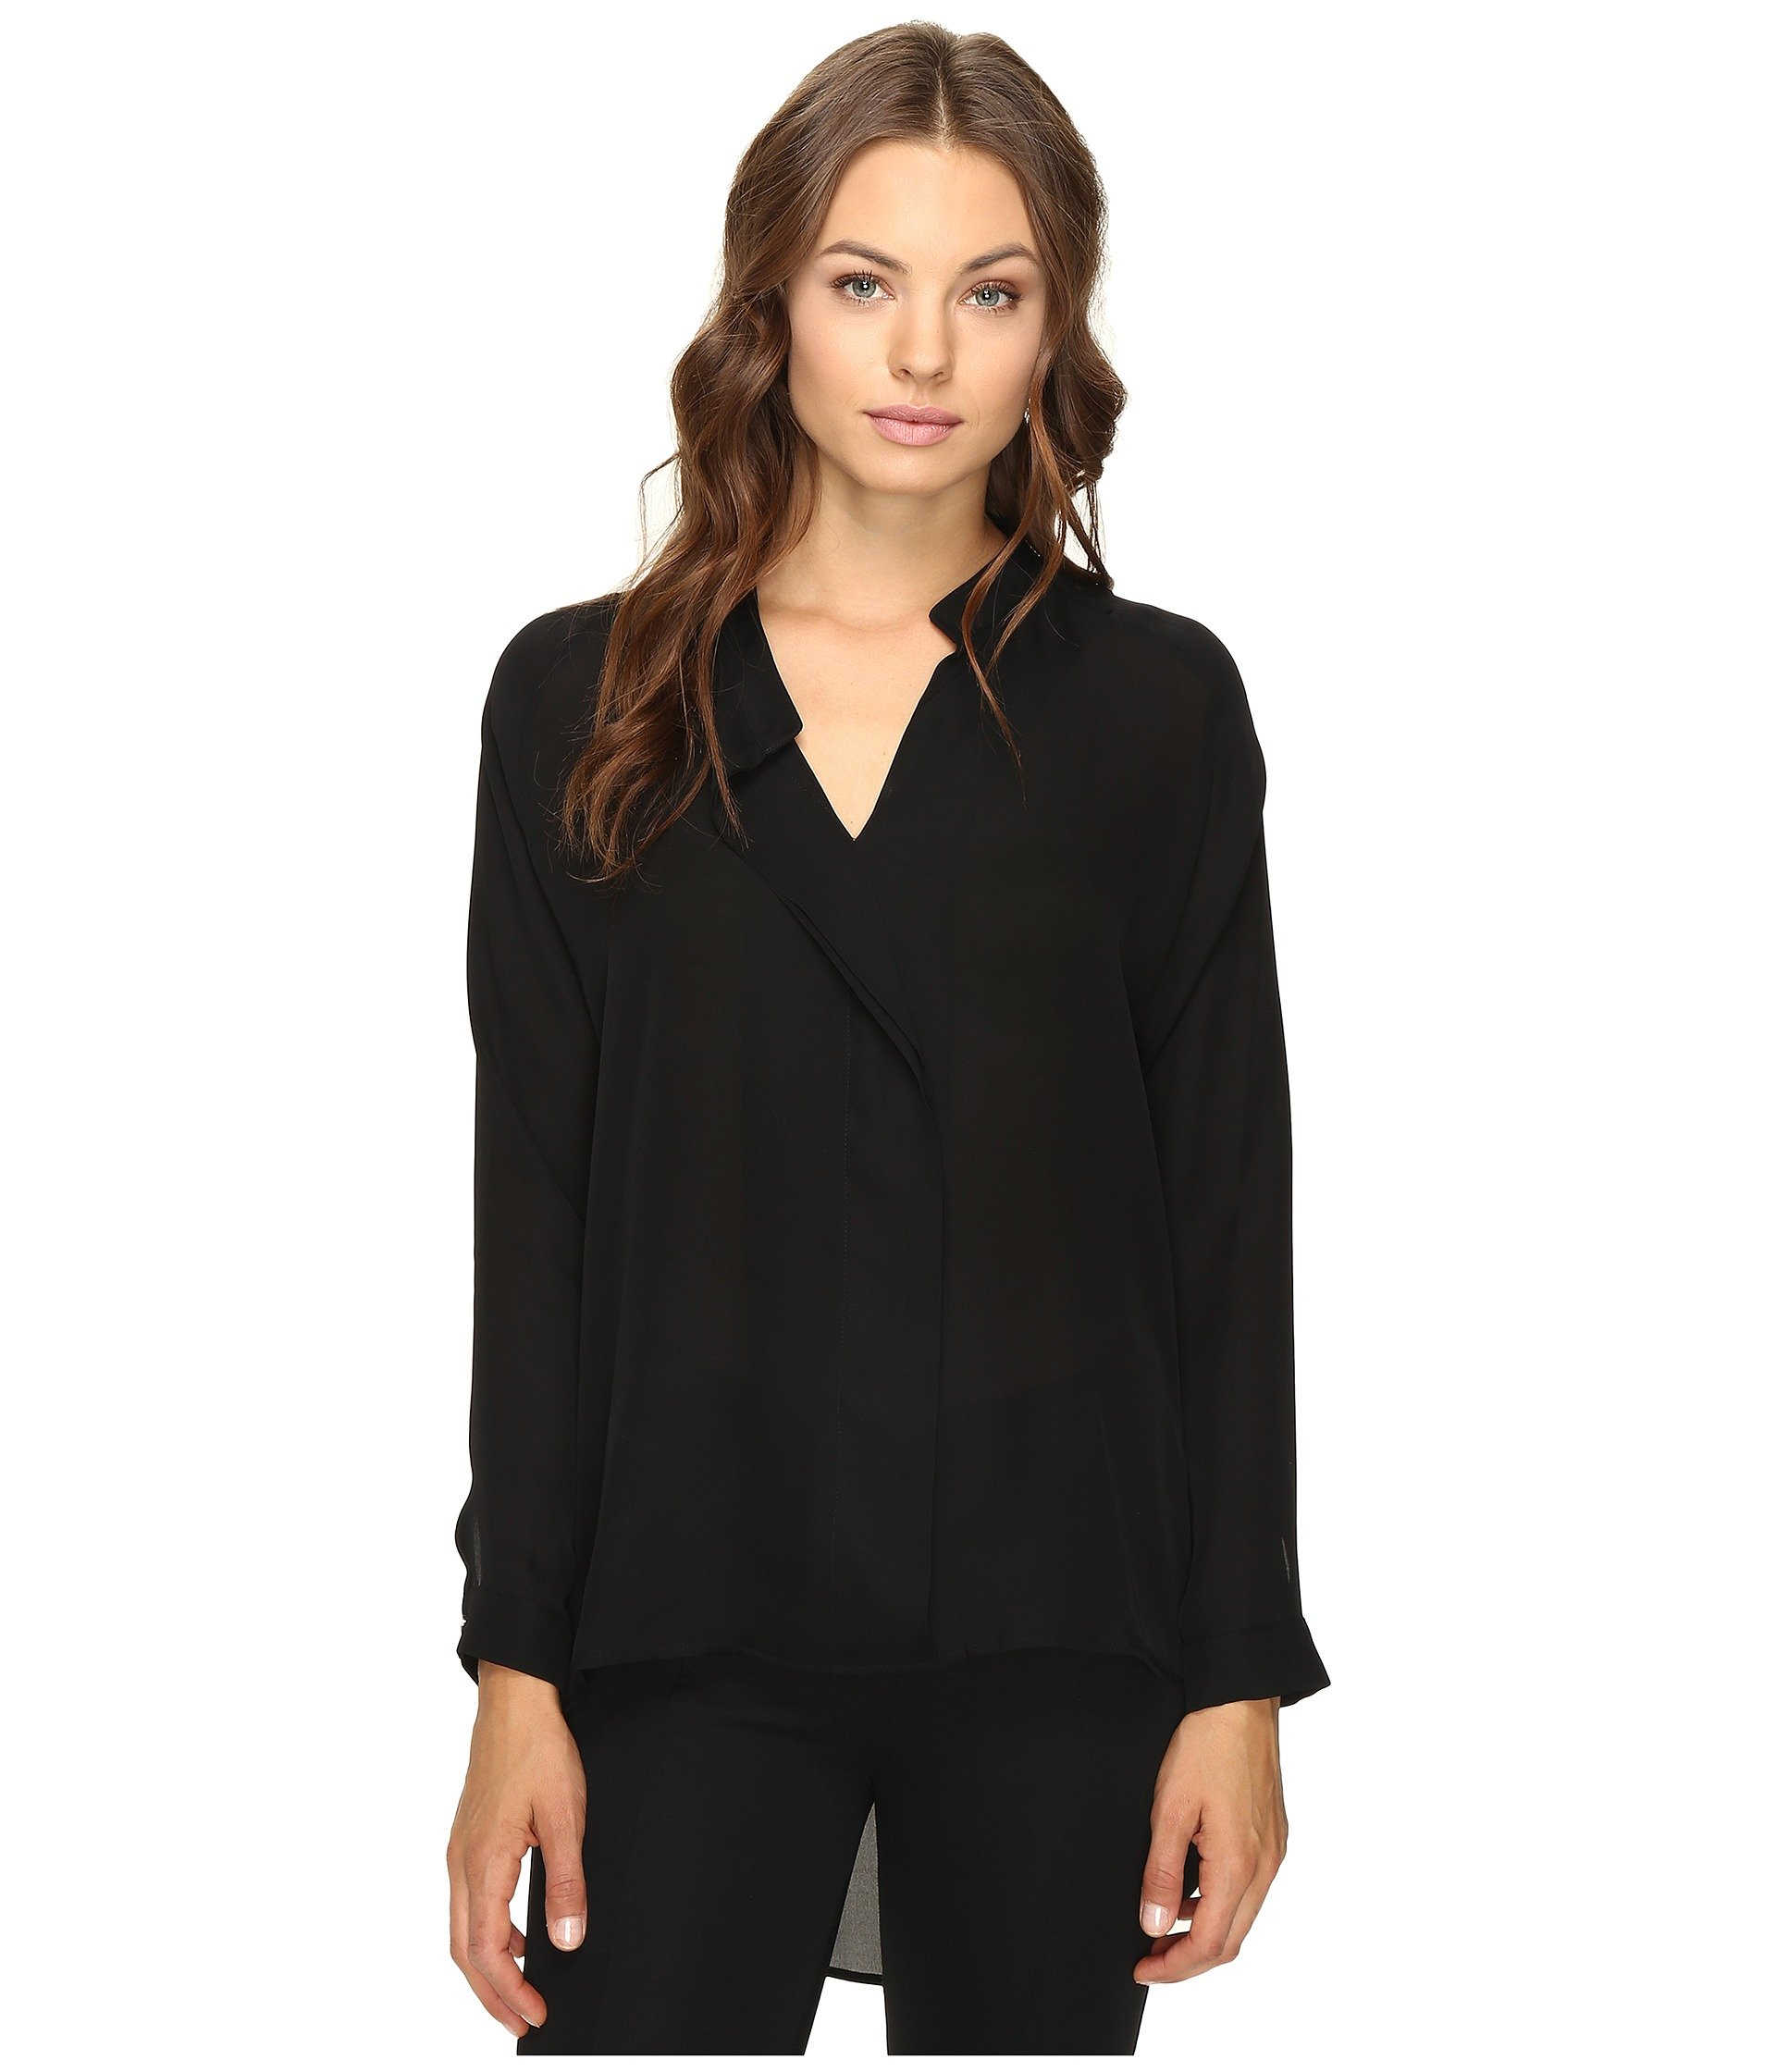 HEATHER Long Sleeve Silk Collared Blouse, Black